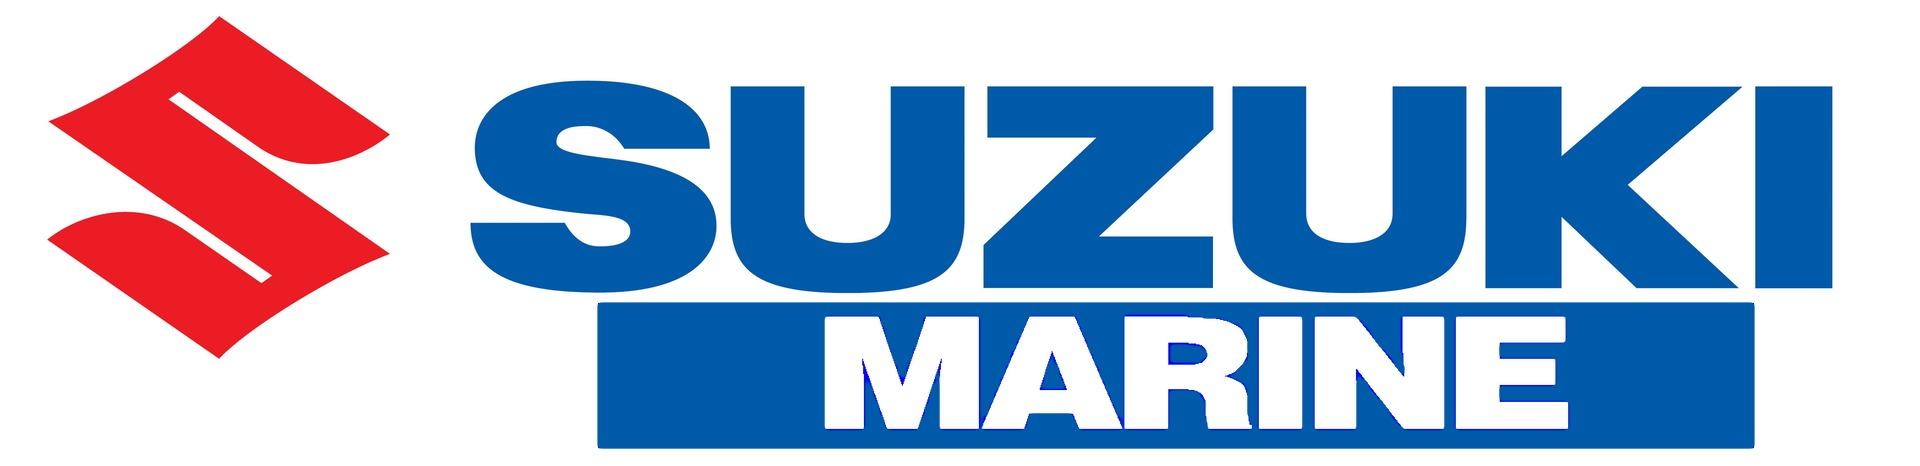 Suzuki Marine